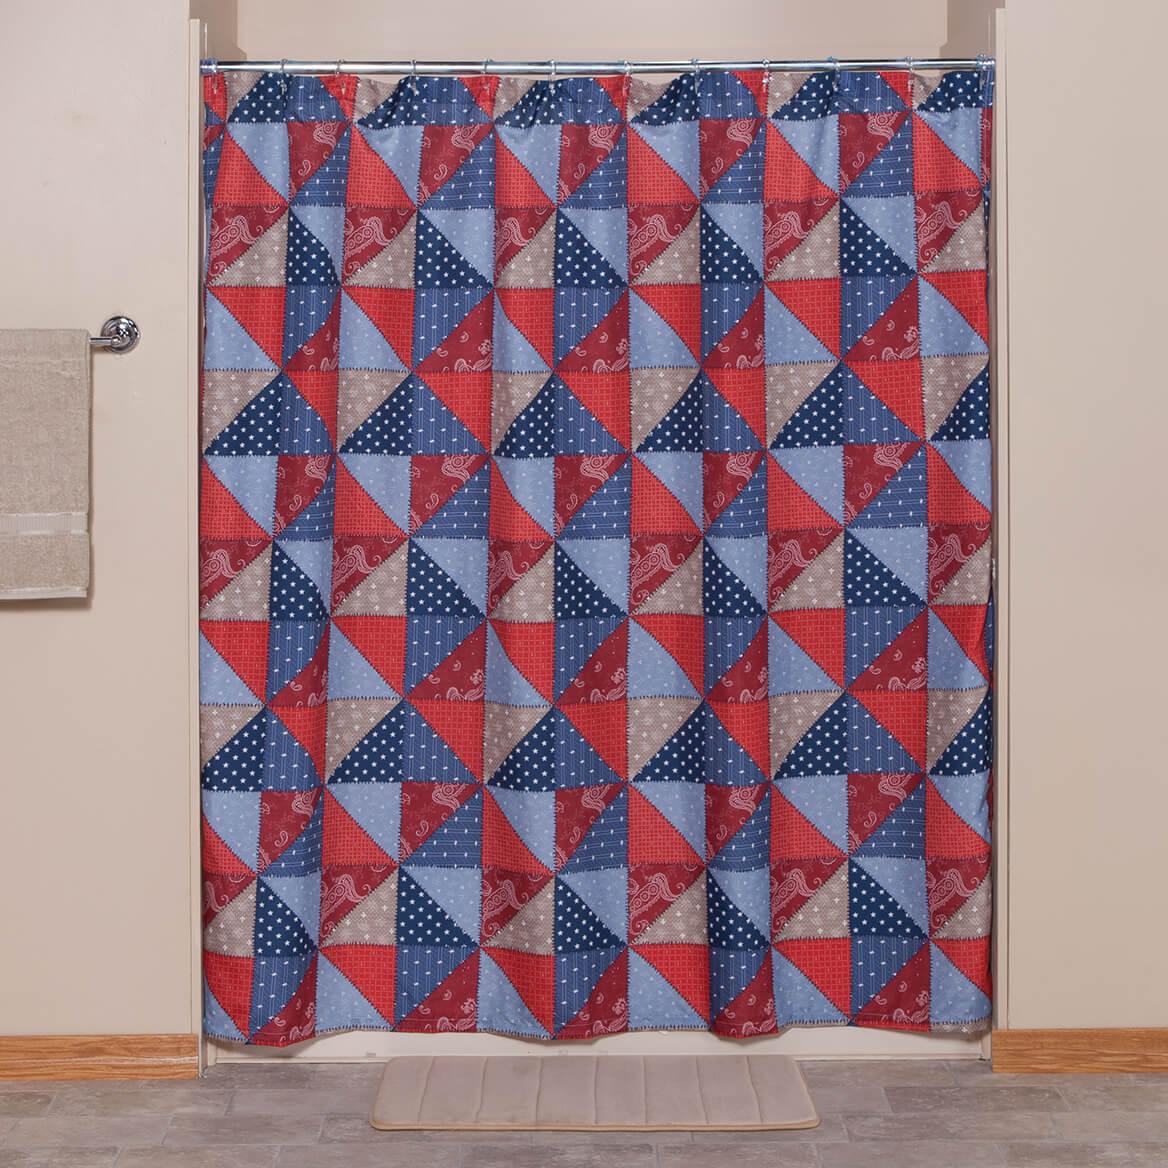 Americana Shower Curtain - Fabric Shower Curtain - Miles Kimball